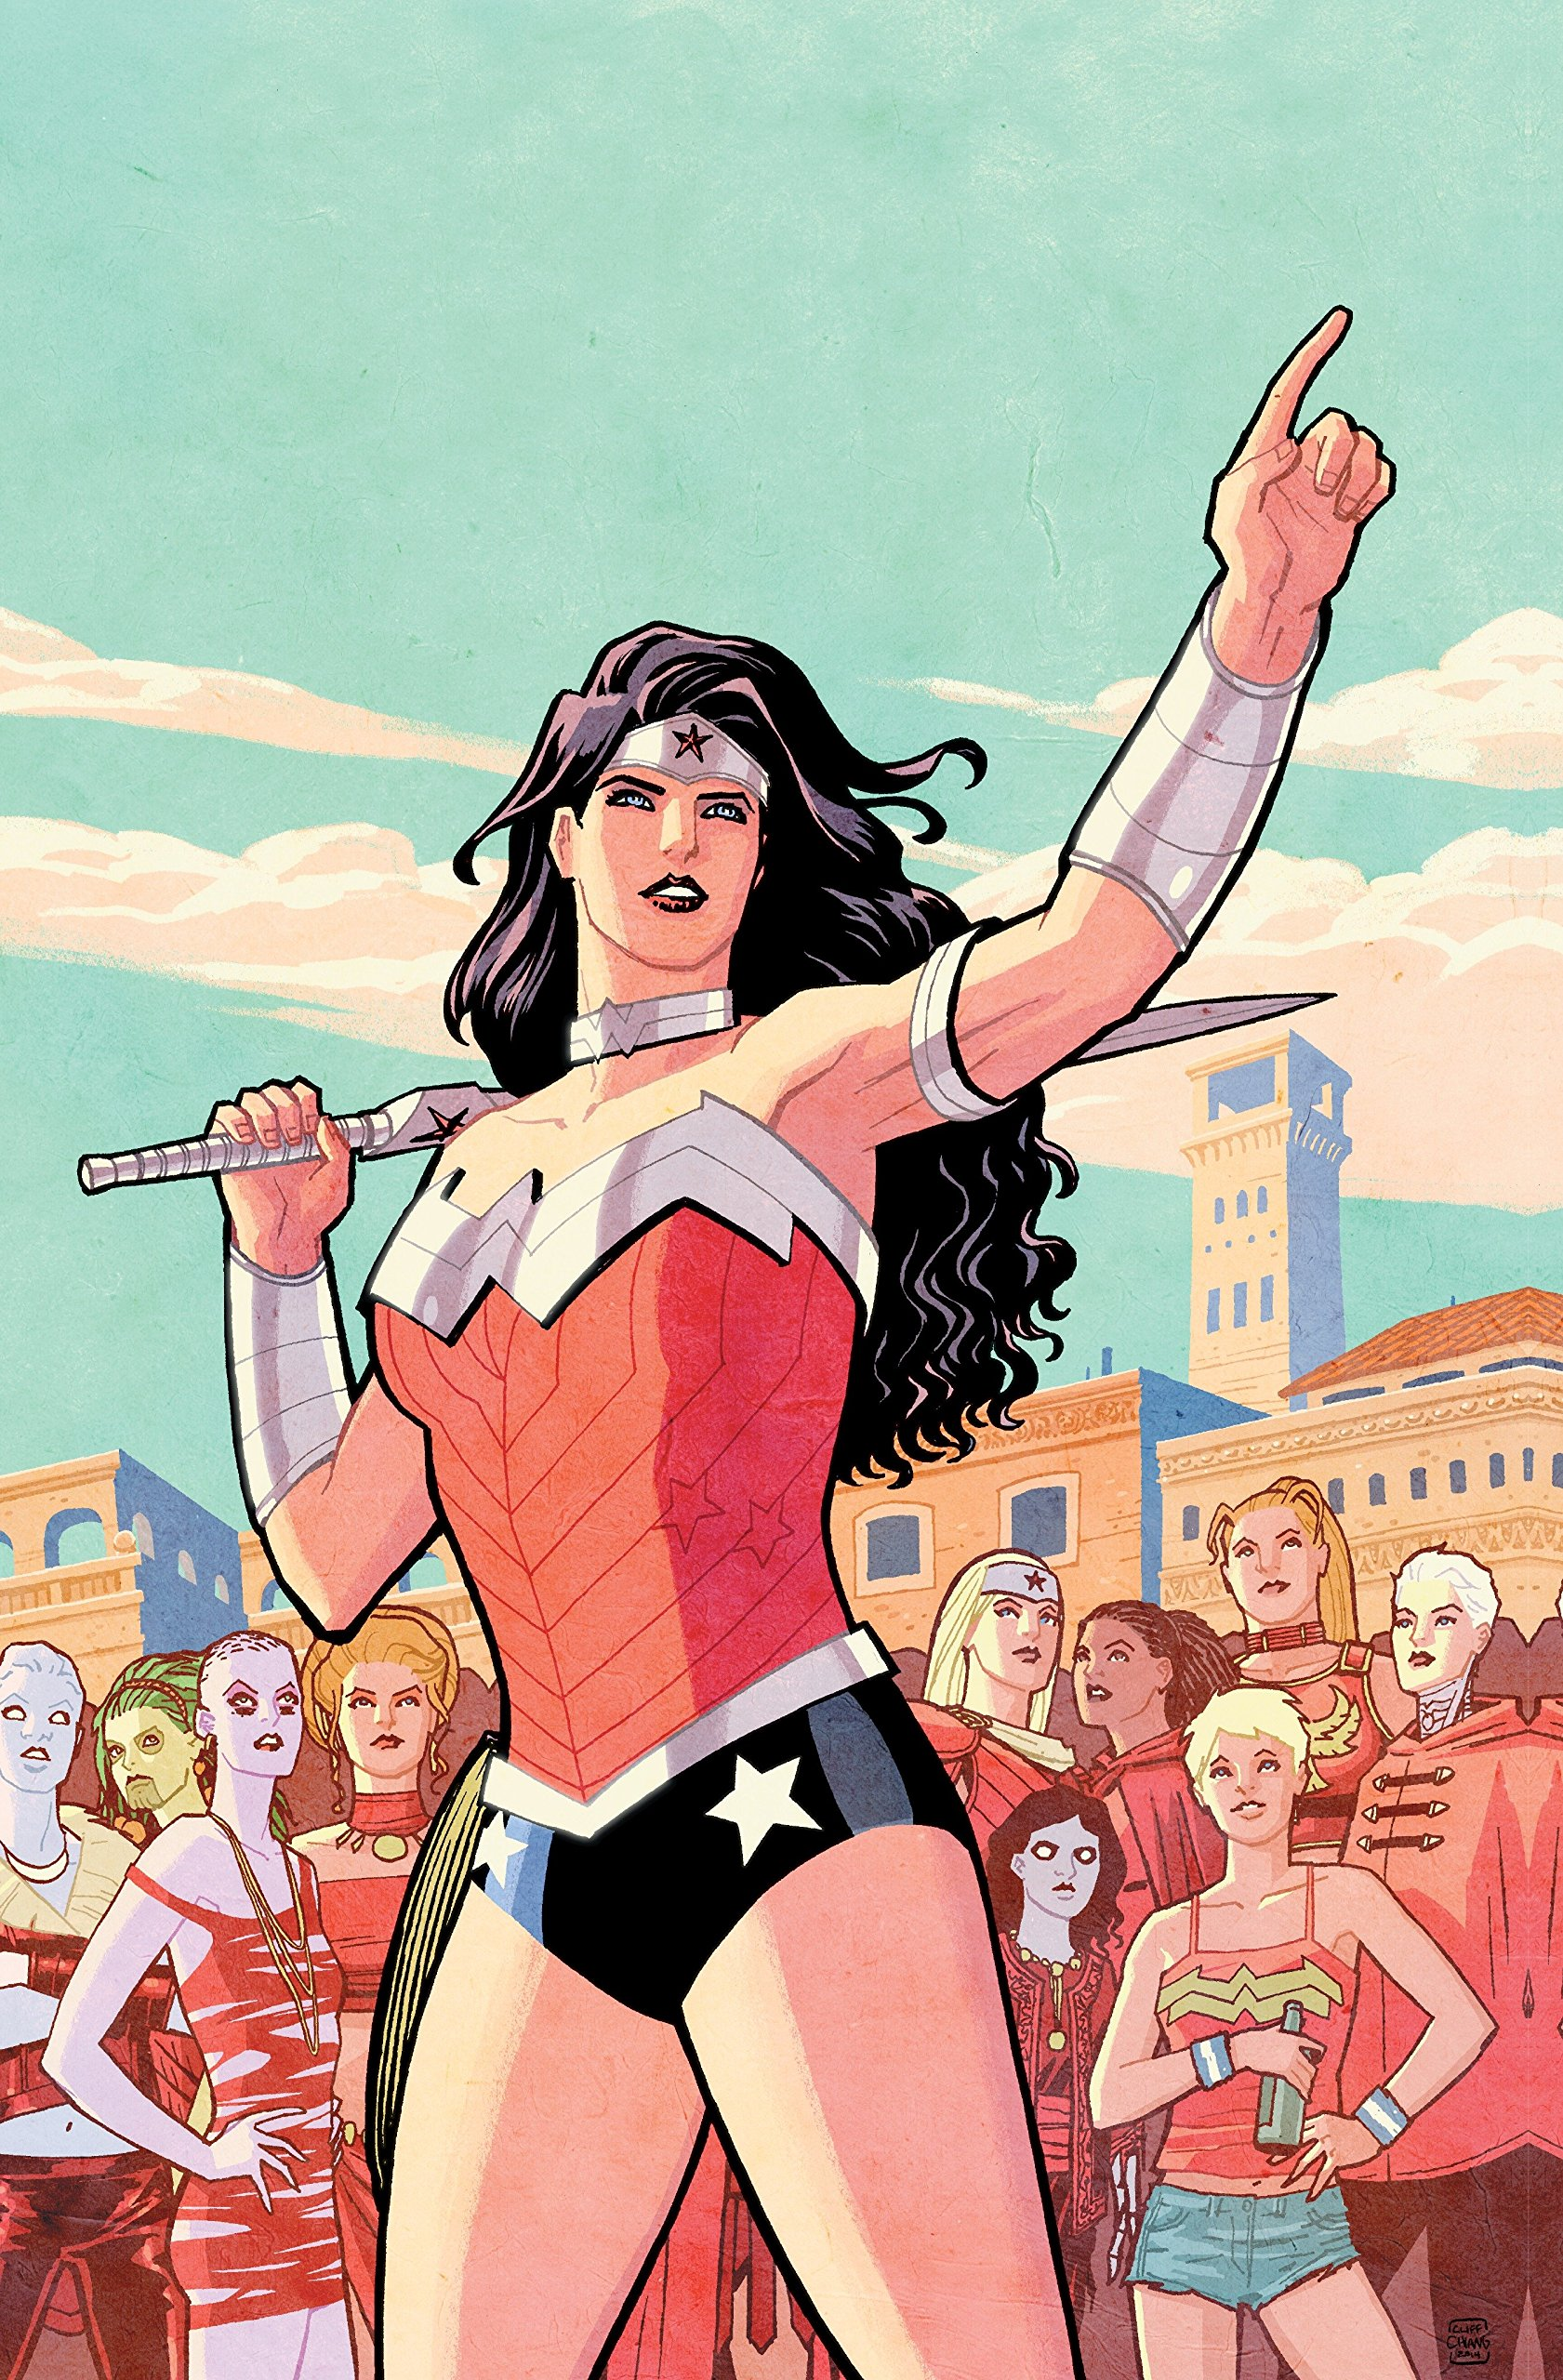 994e36a4b2e7e Amazon.com: Absolute Wonder Woman by Brian Azzarello & Cliff Chiang ...